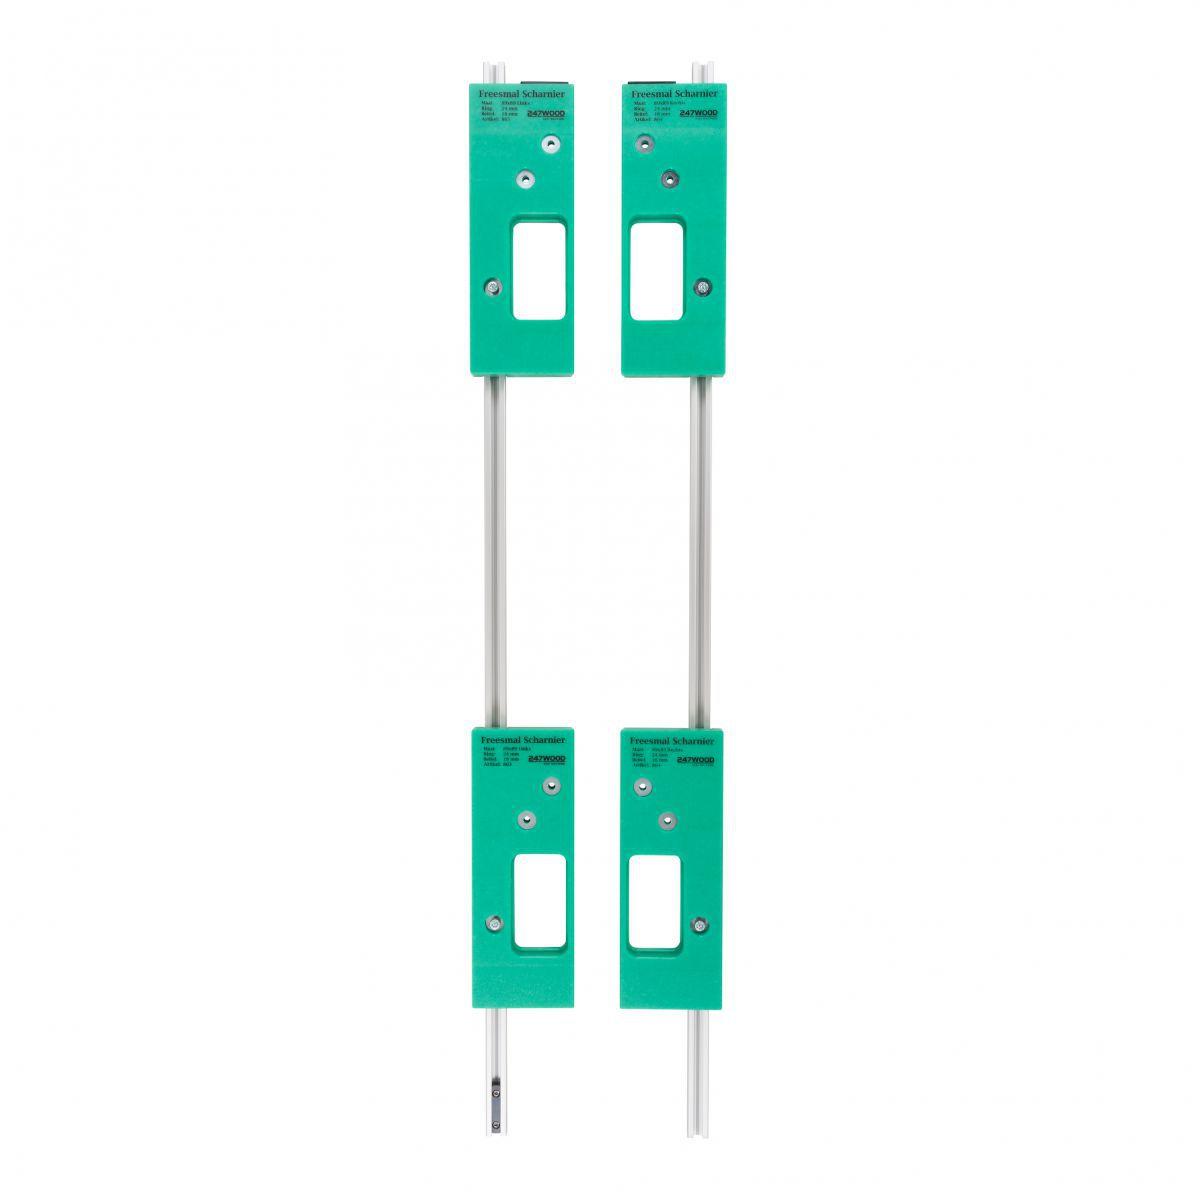 4 piece router template set size 89x89